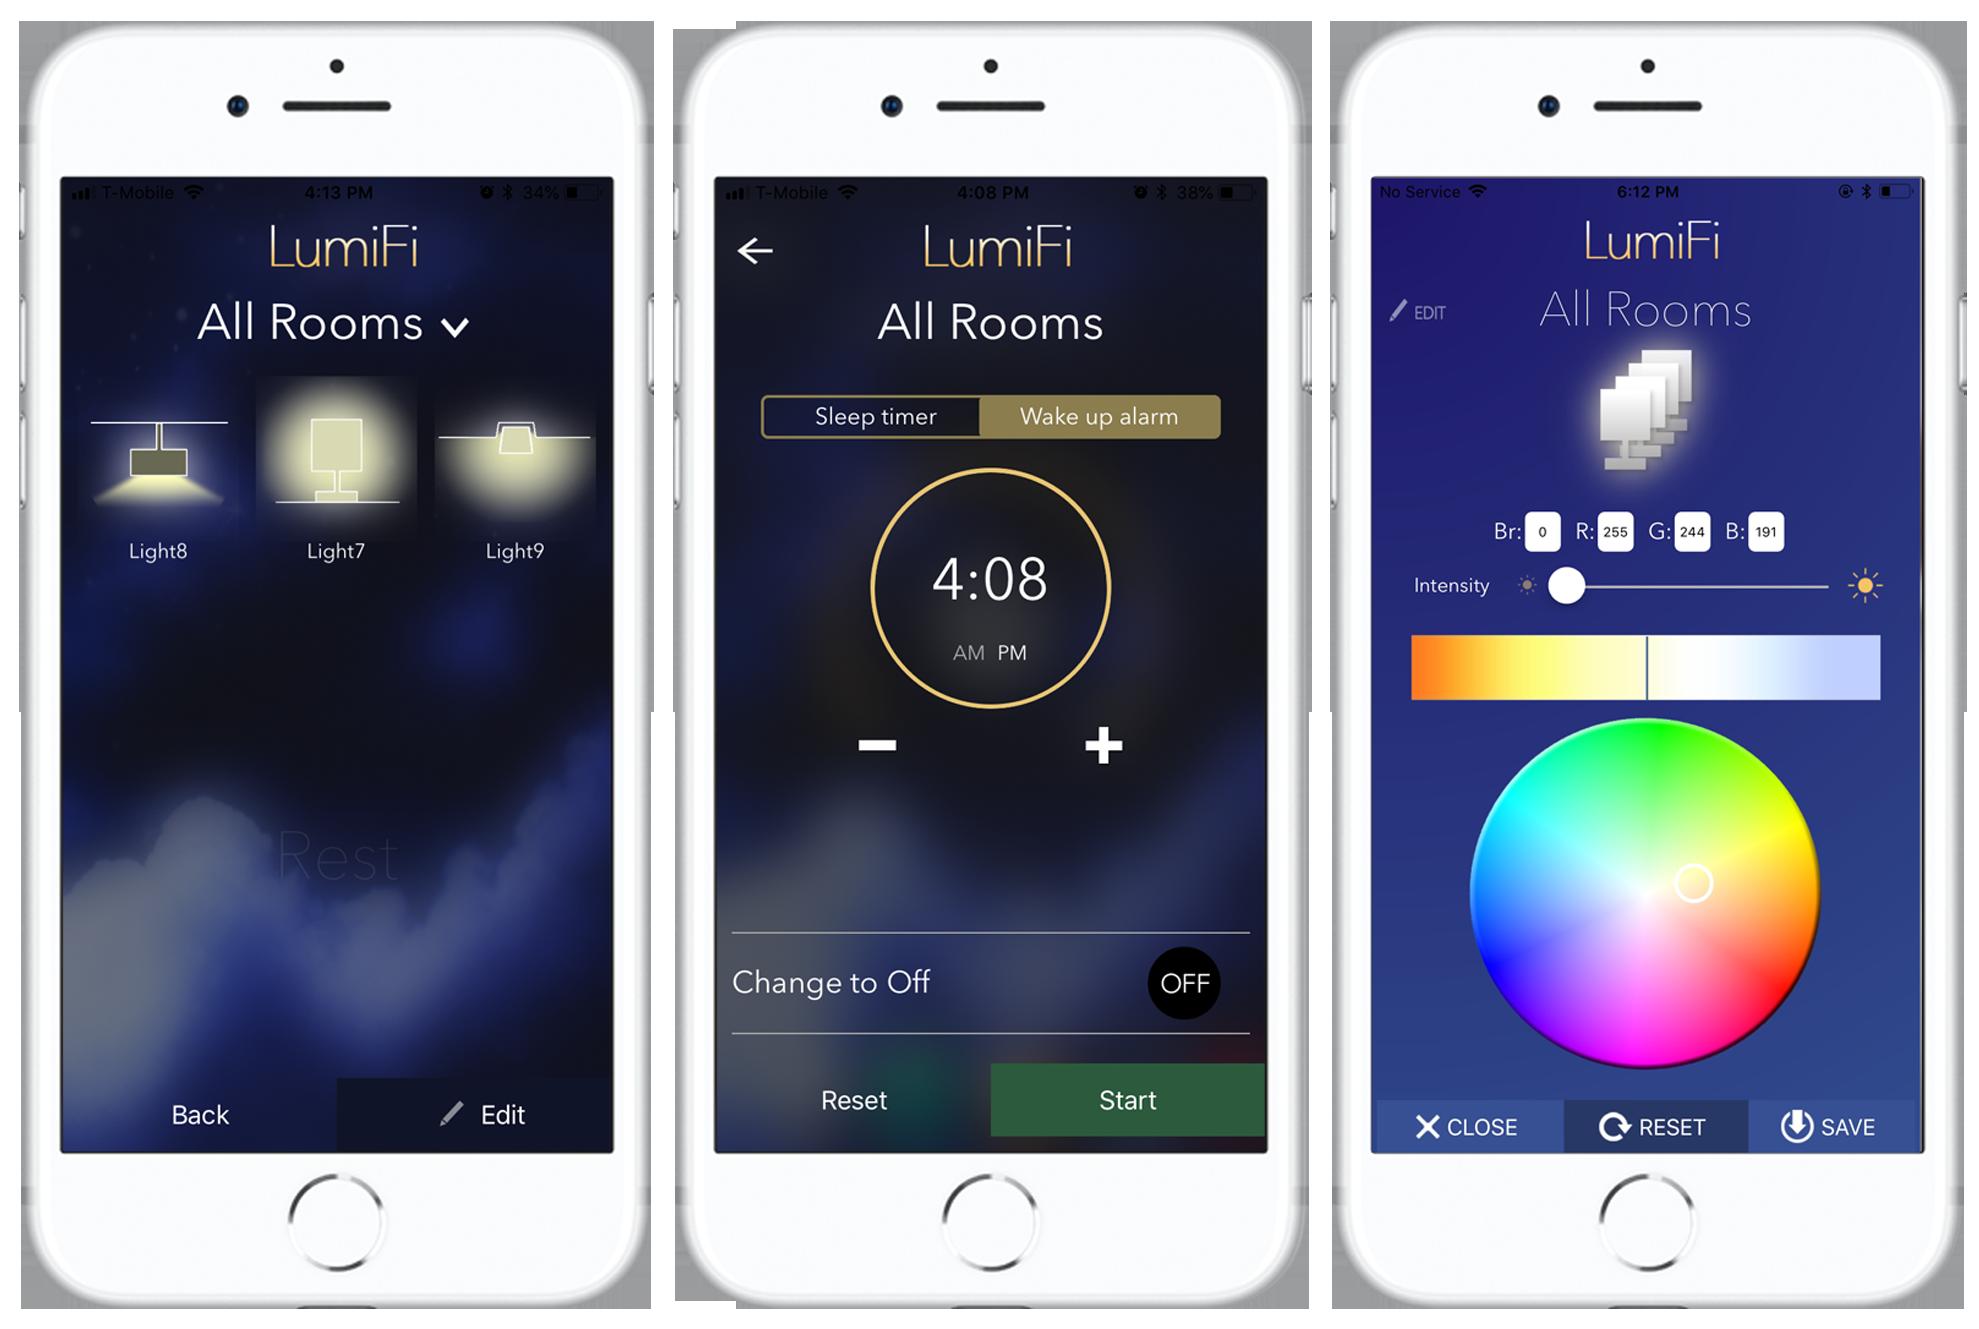 LumiFi-Screen-Collage-3.png